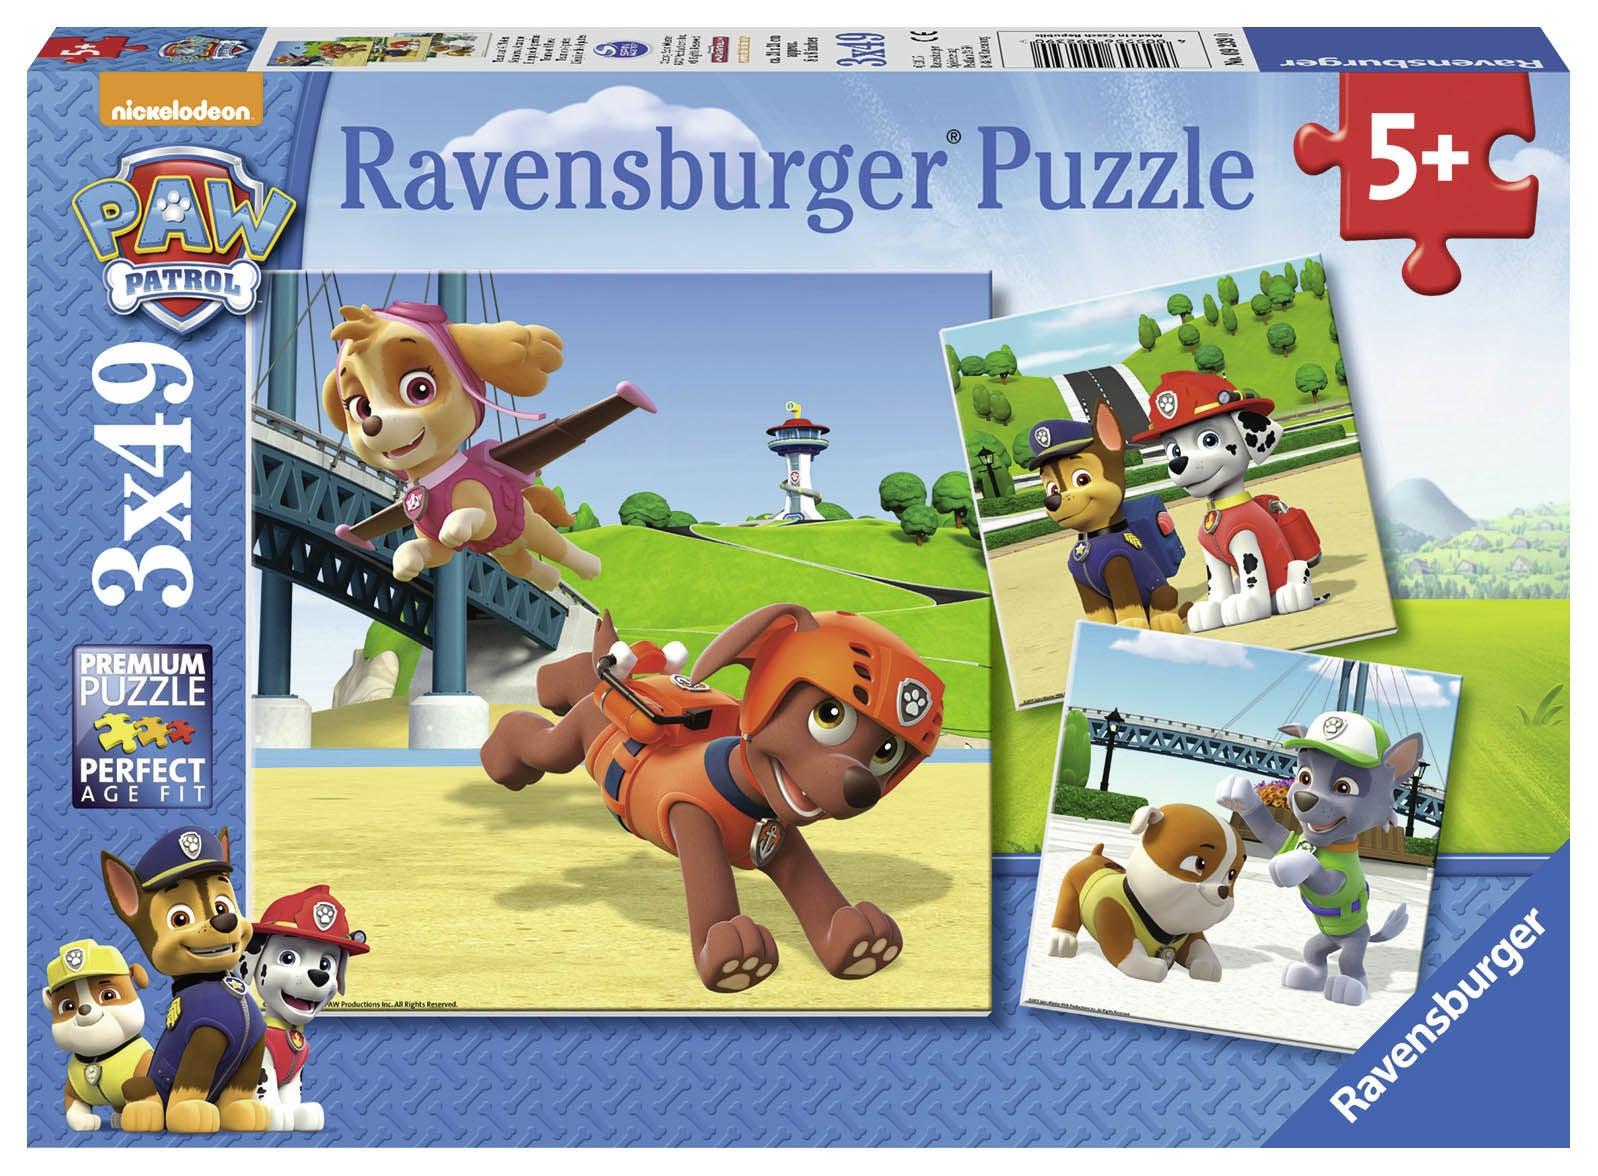 Ravensburger Pussel Paw Patrol 3x49 Bitar